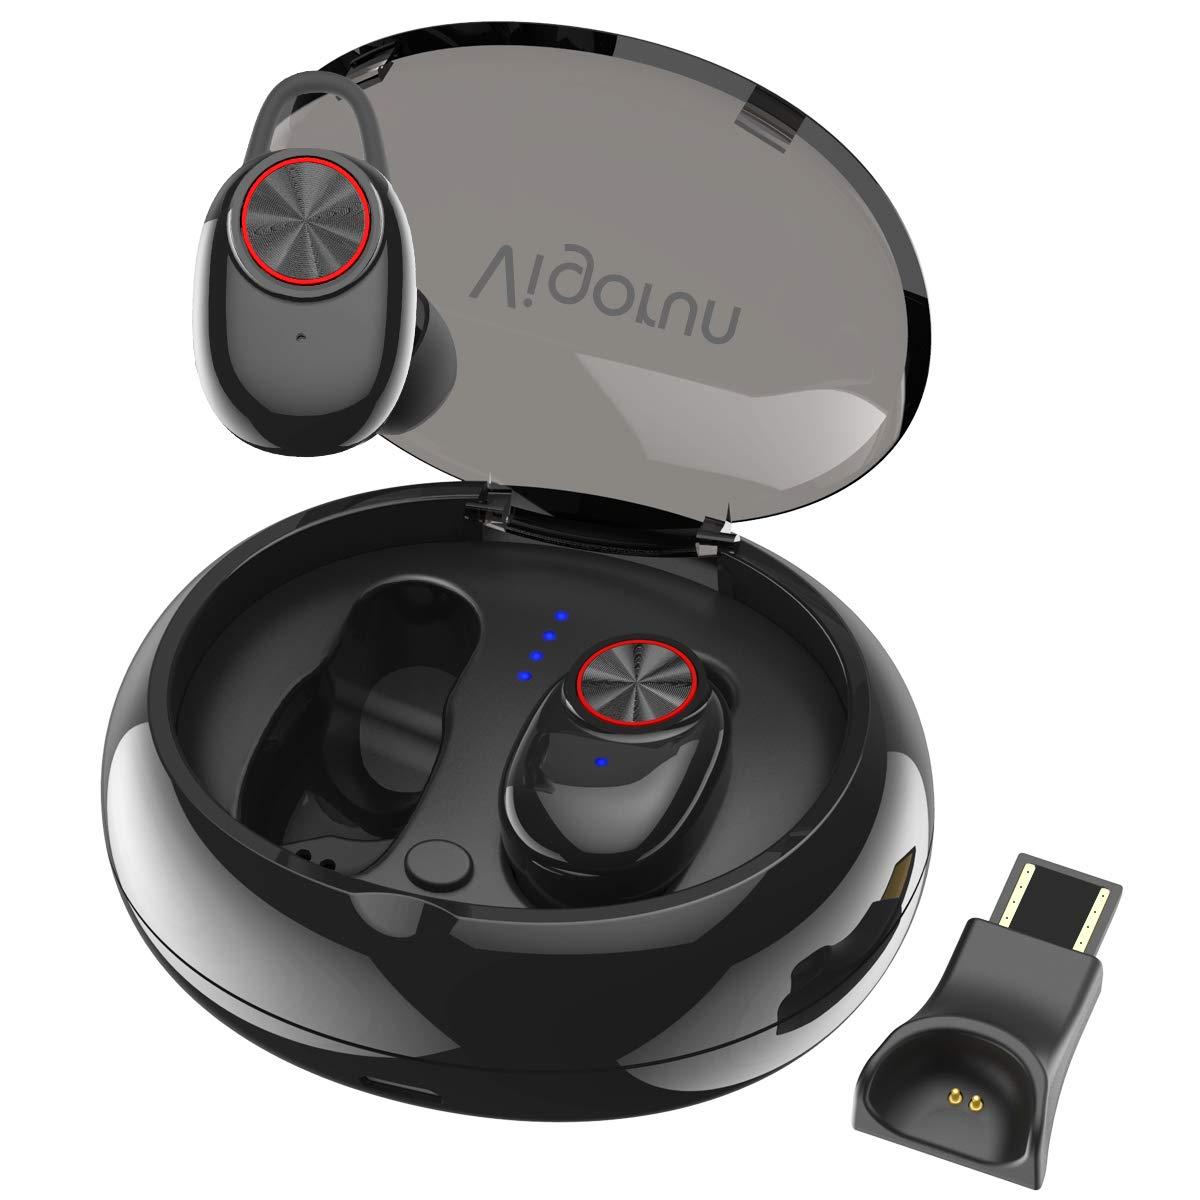 Auricolari Wireless Bluetooth Senza Fili 51bff37324ed